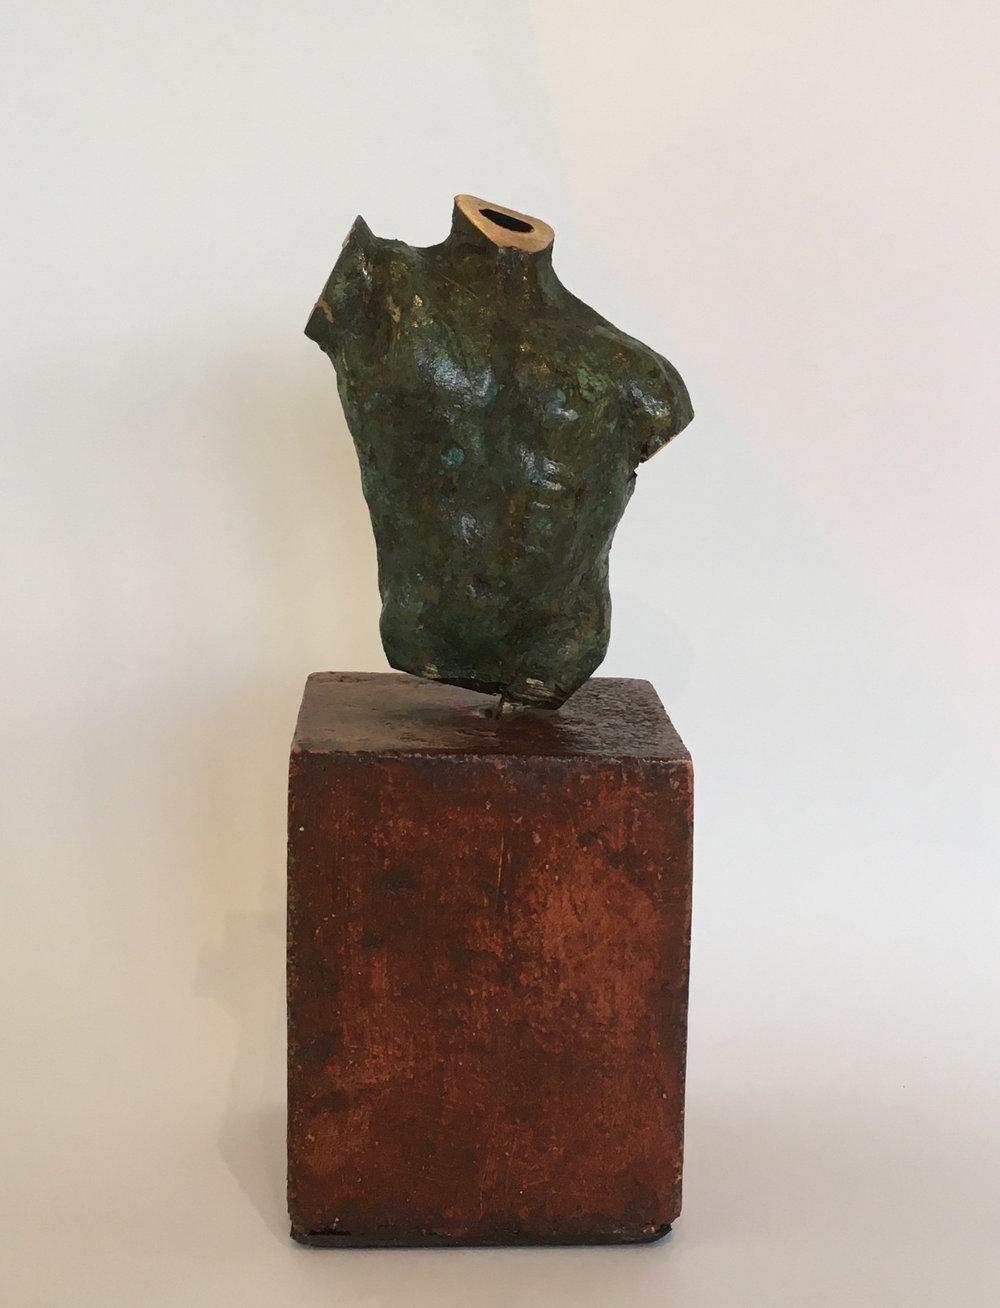 Title: Torso IV  Size: H 19 cm  Medium: Bronze Edition 1/1  Price: £1200